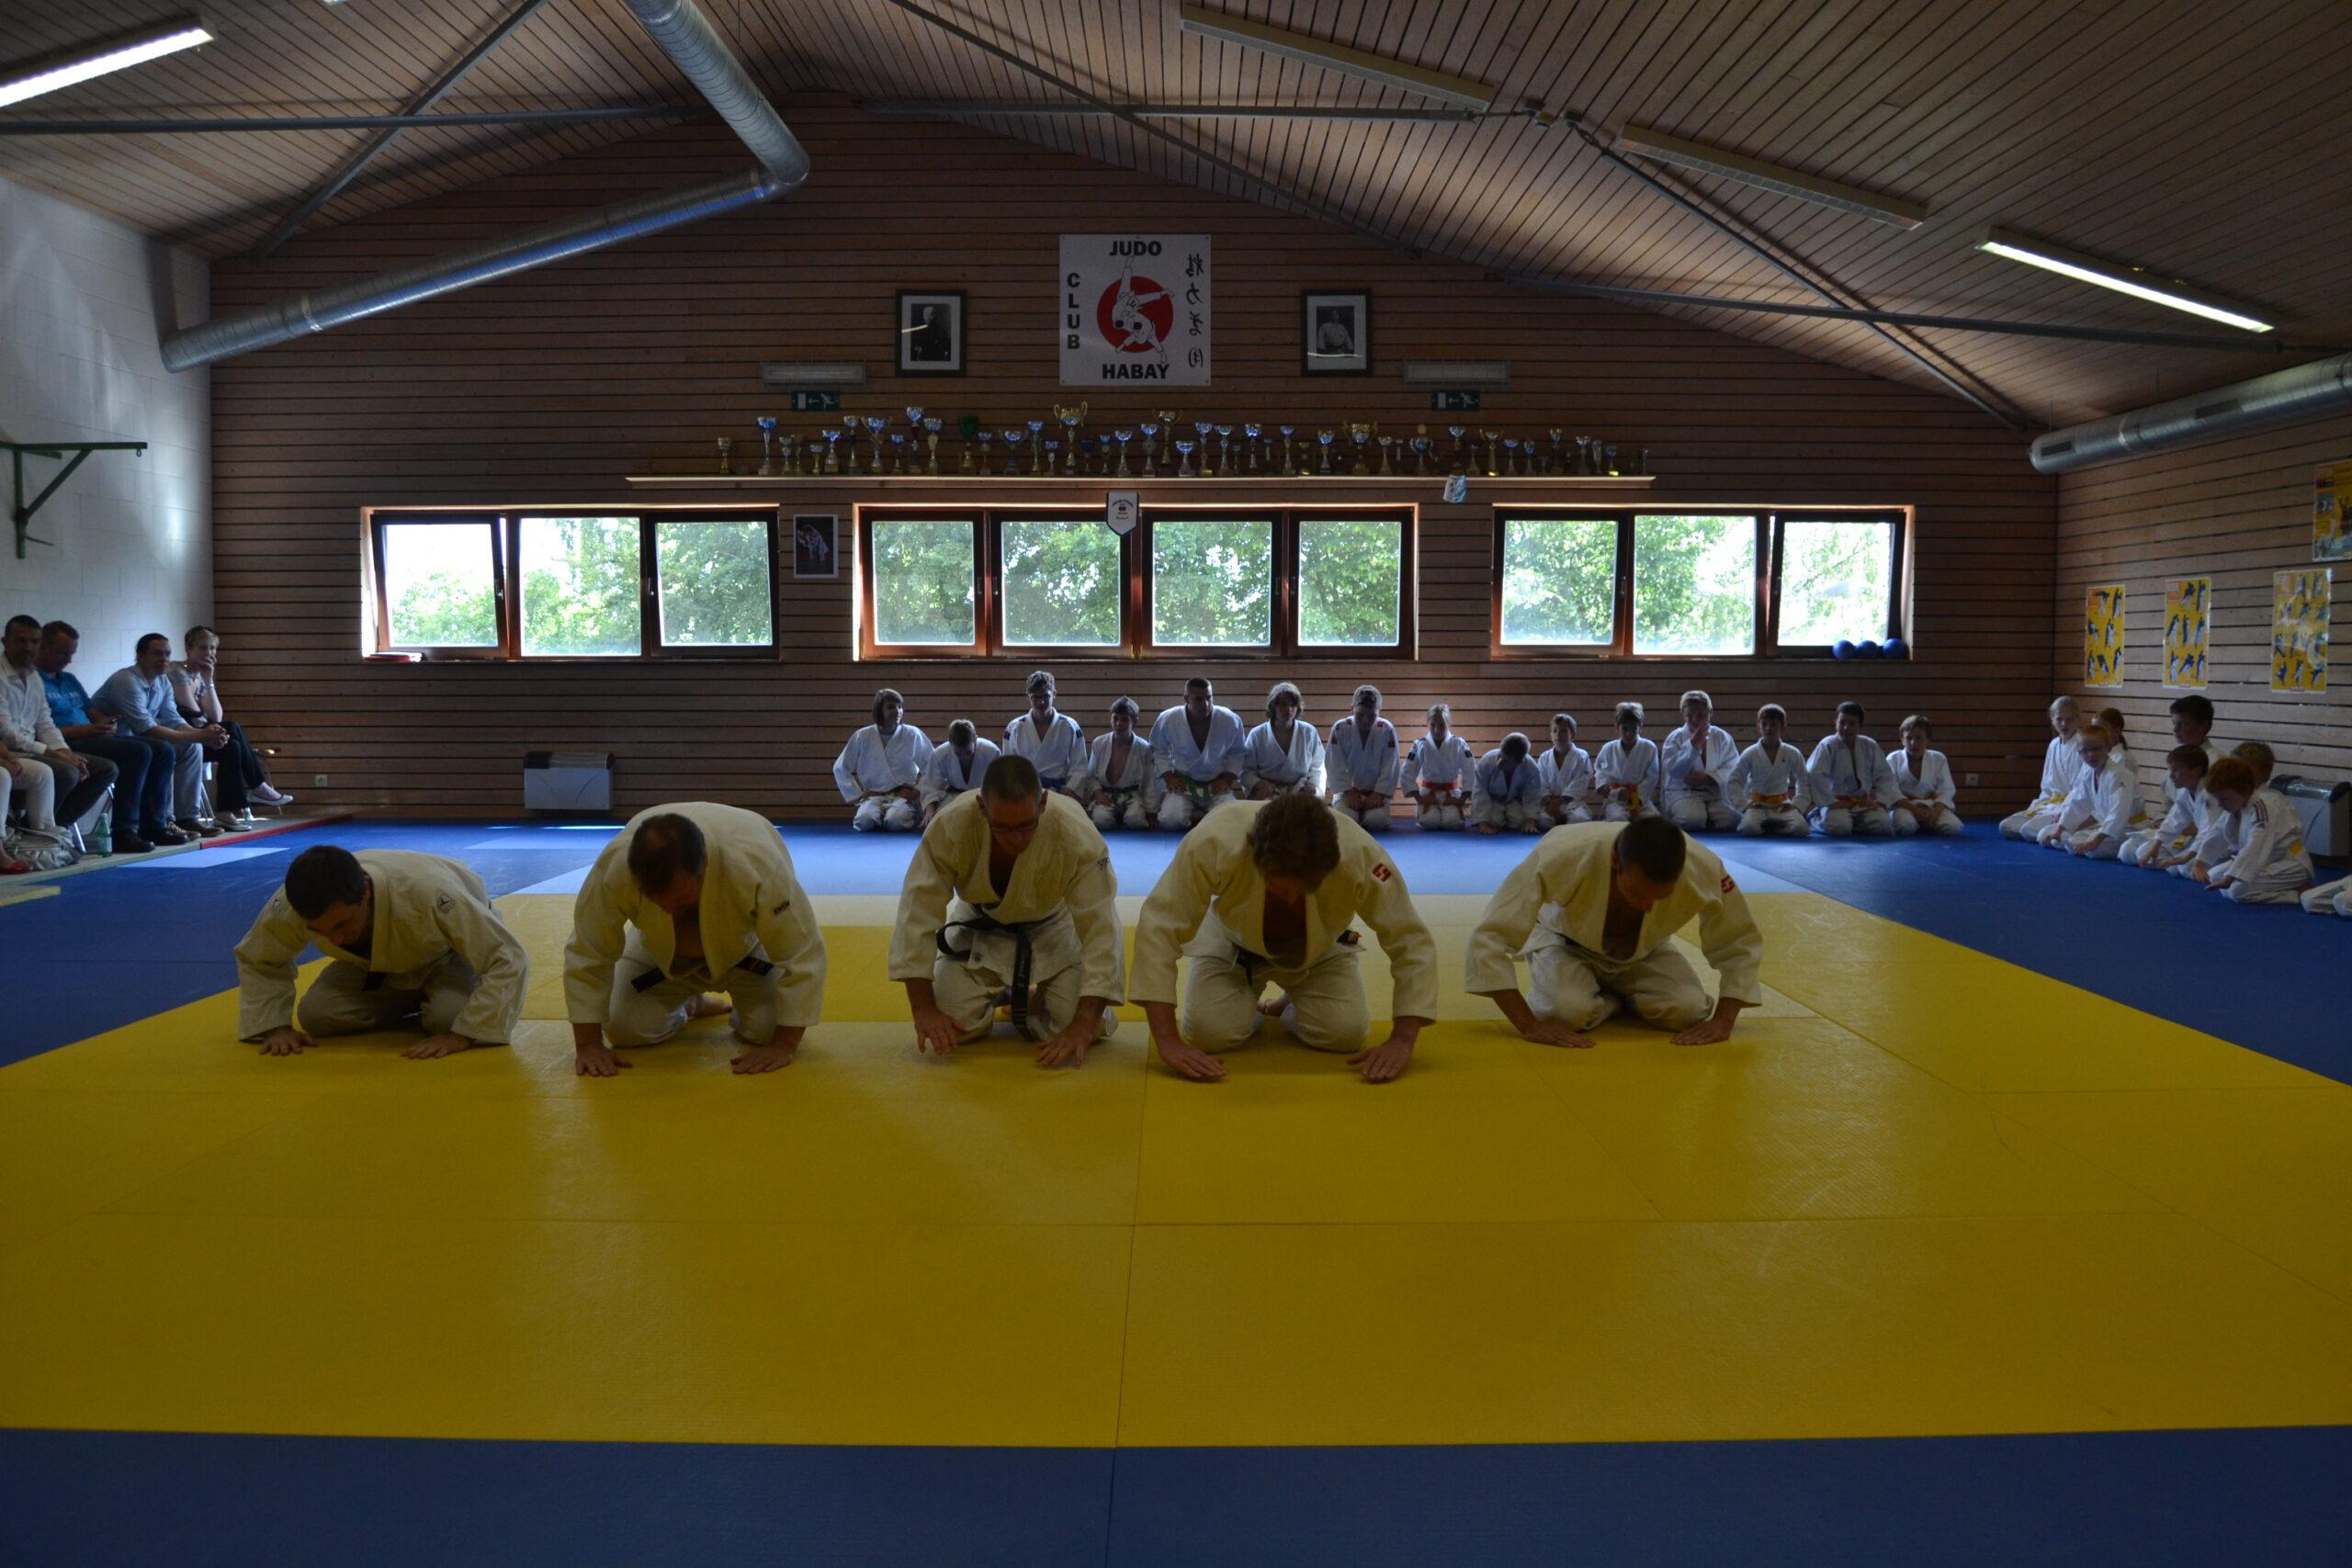 //media/jw_sigpro/users/0000001062/photo judo club habay/DSC_0128